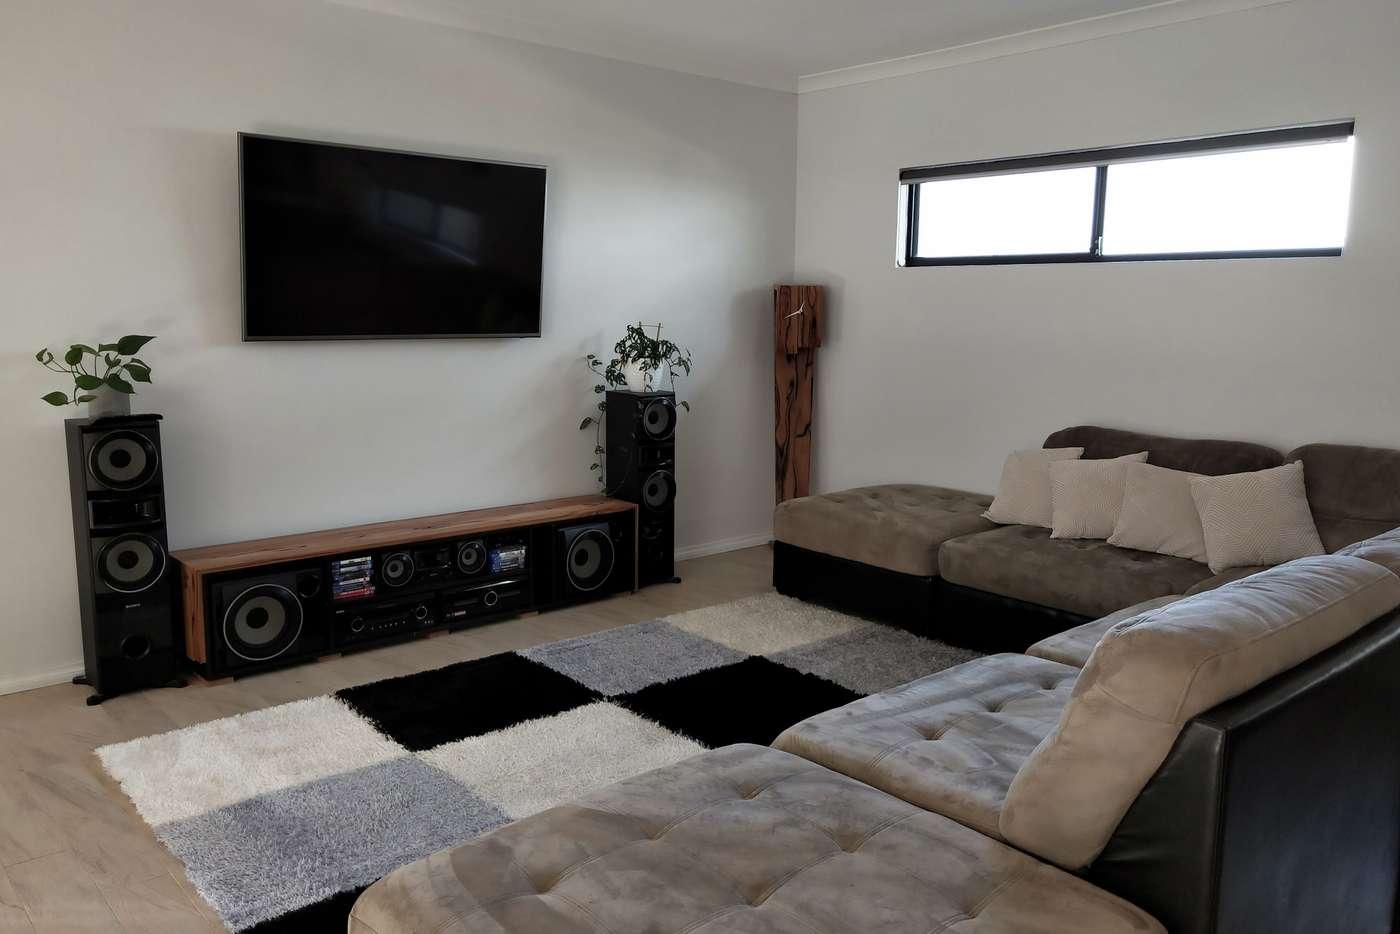 Sixth view of Homely house listing, 13 Flourish Way, Craigie WA 6025